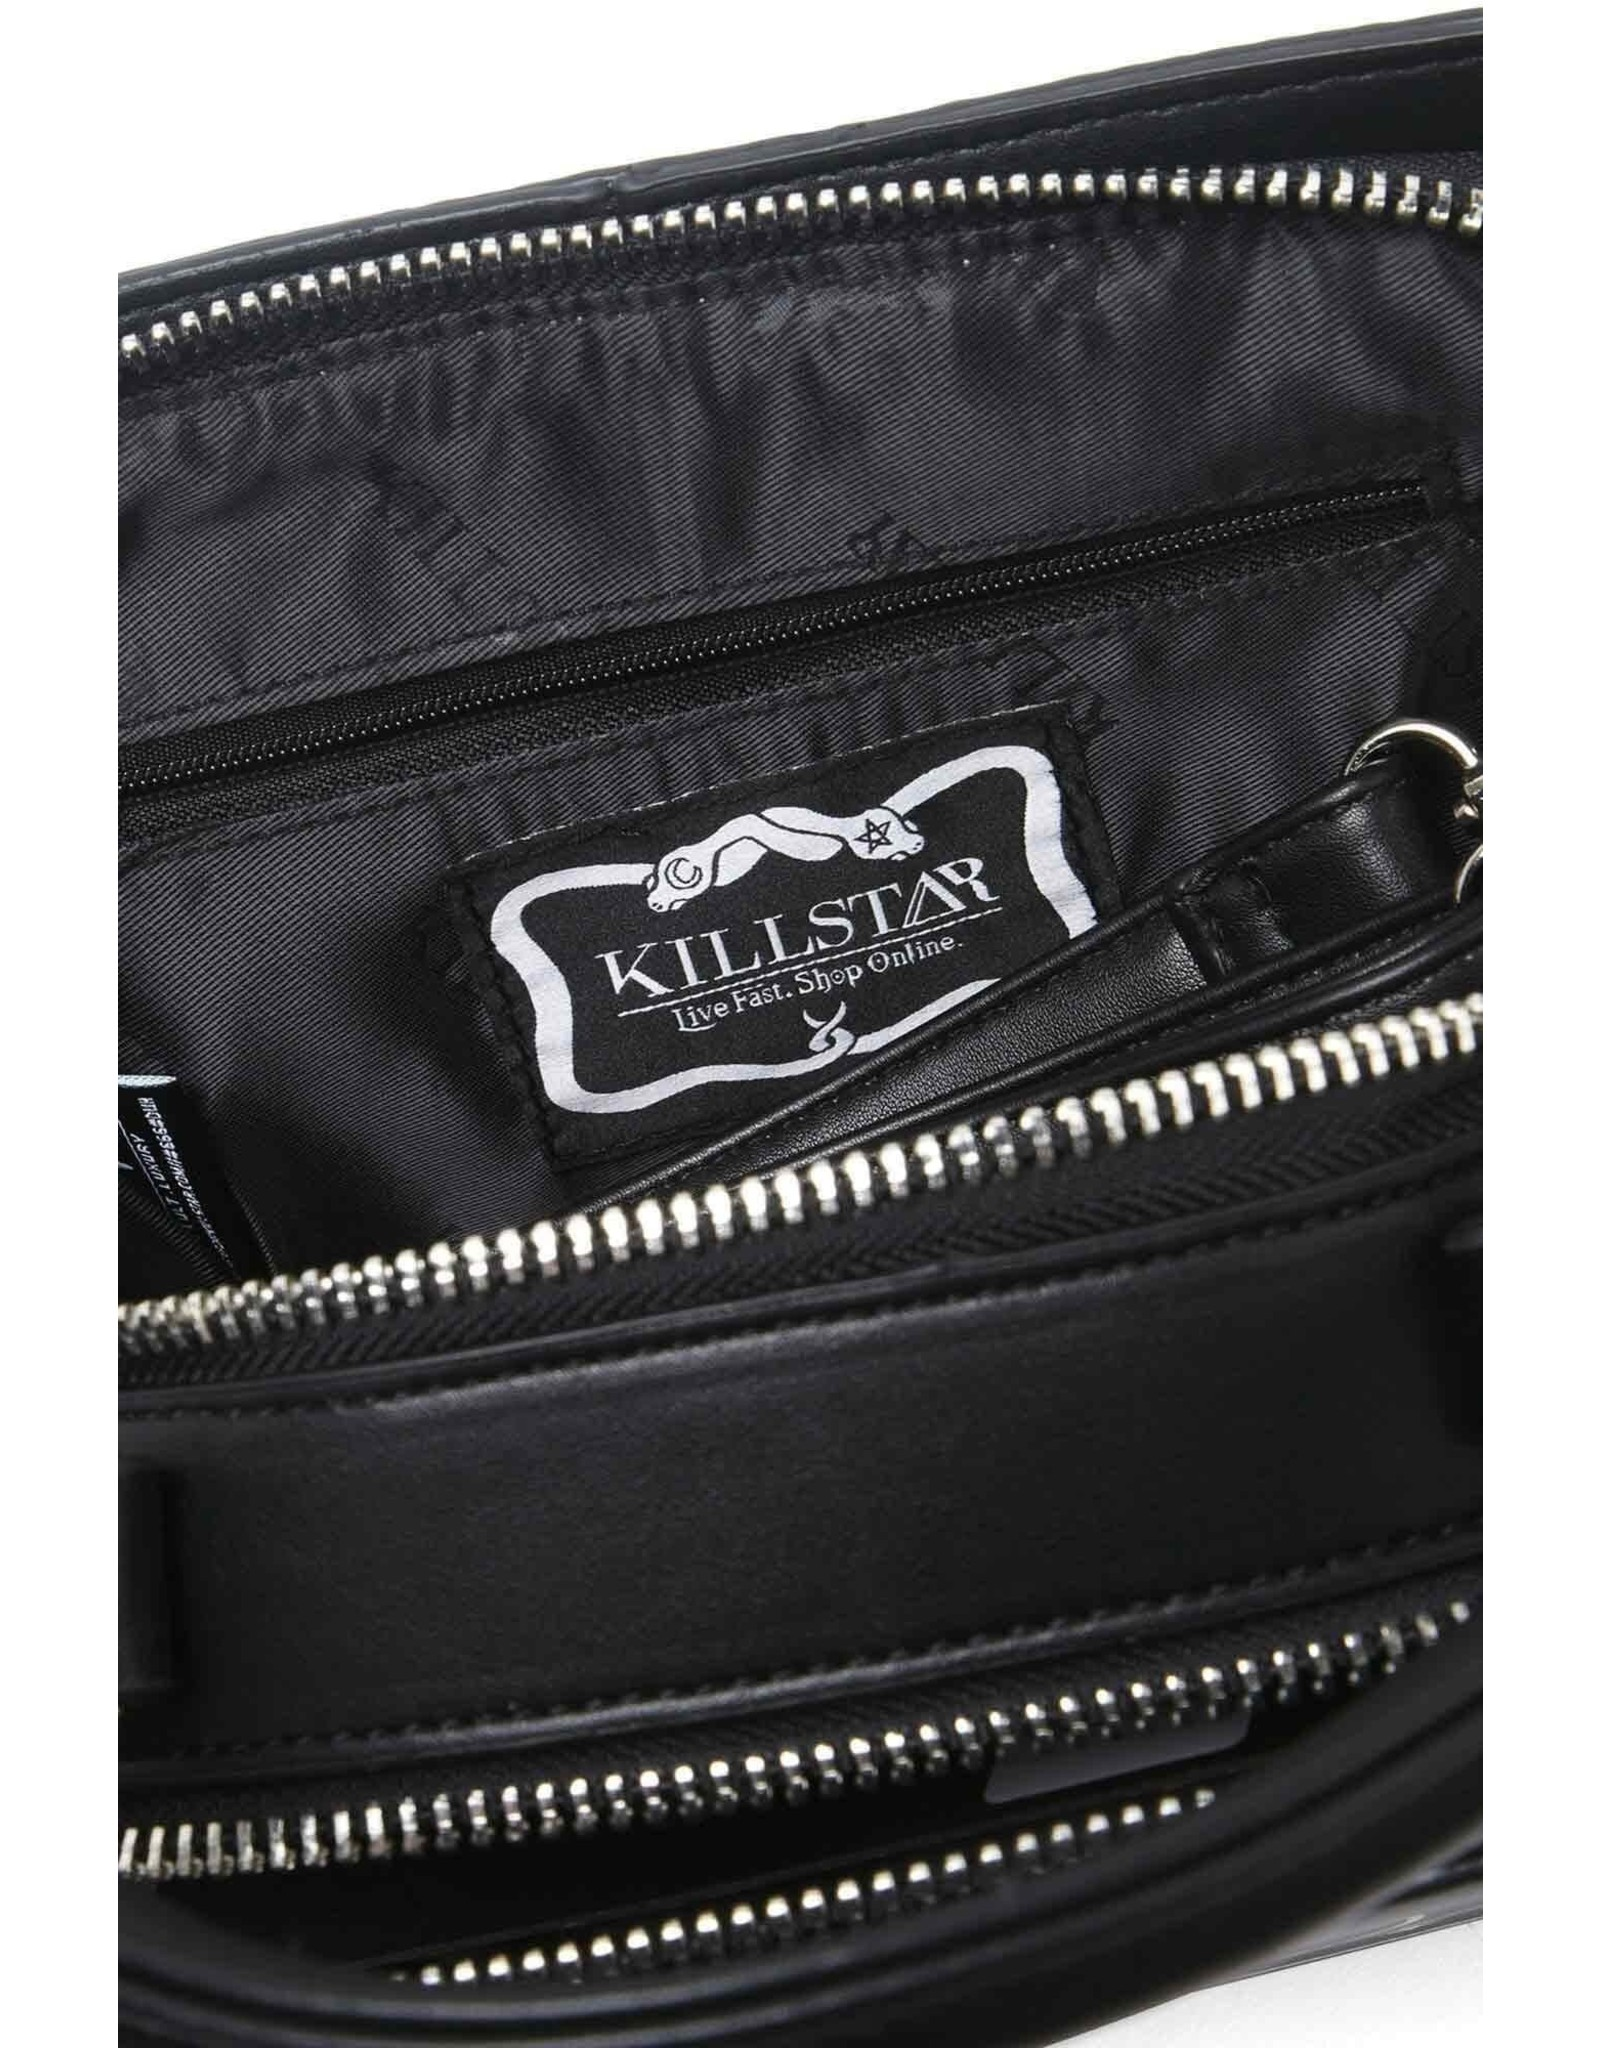 Killstar Gothic tassen Steampunk tassen - Killstar Need Space handtas boek